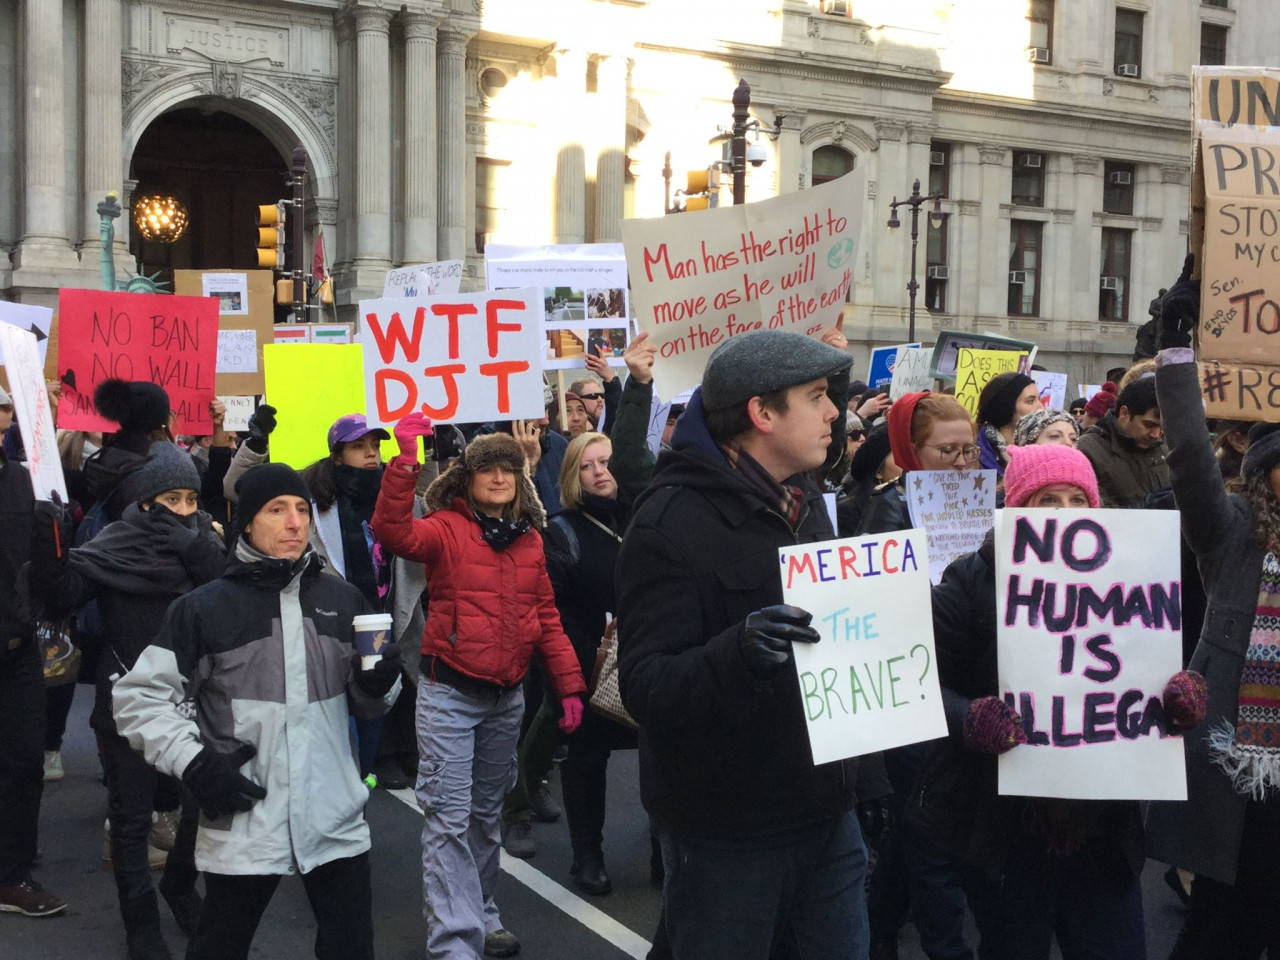 Immigrant Rights Protest - Philadelphia - February 4, 2017 - WTF DJT